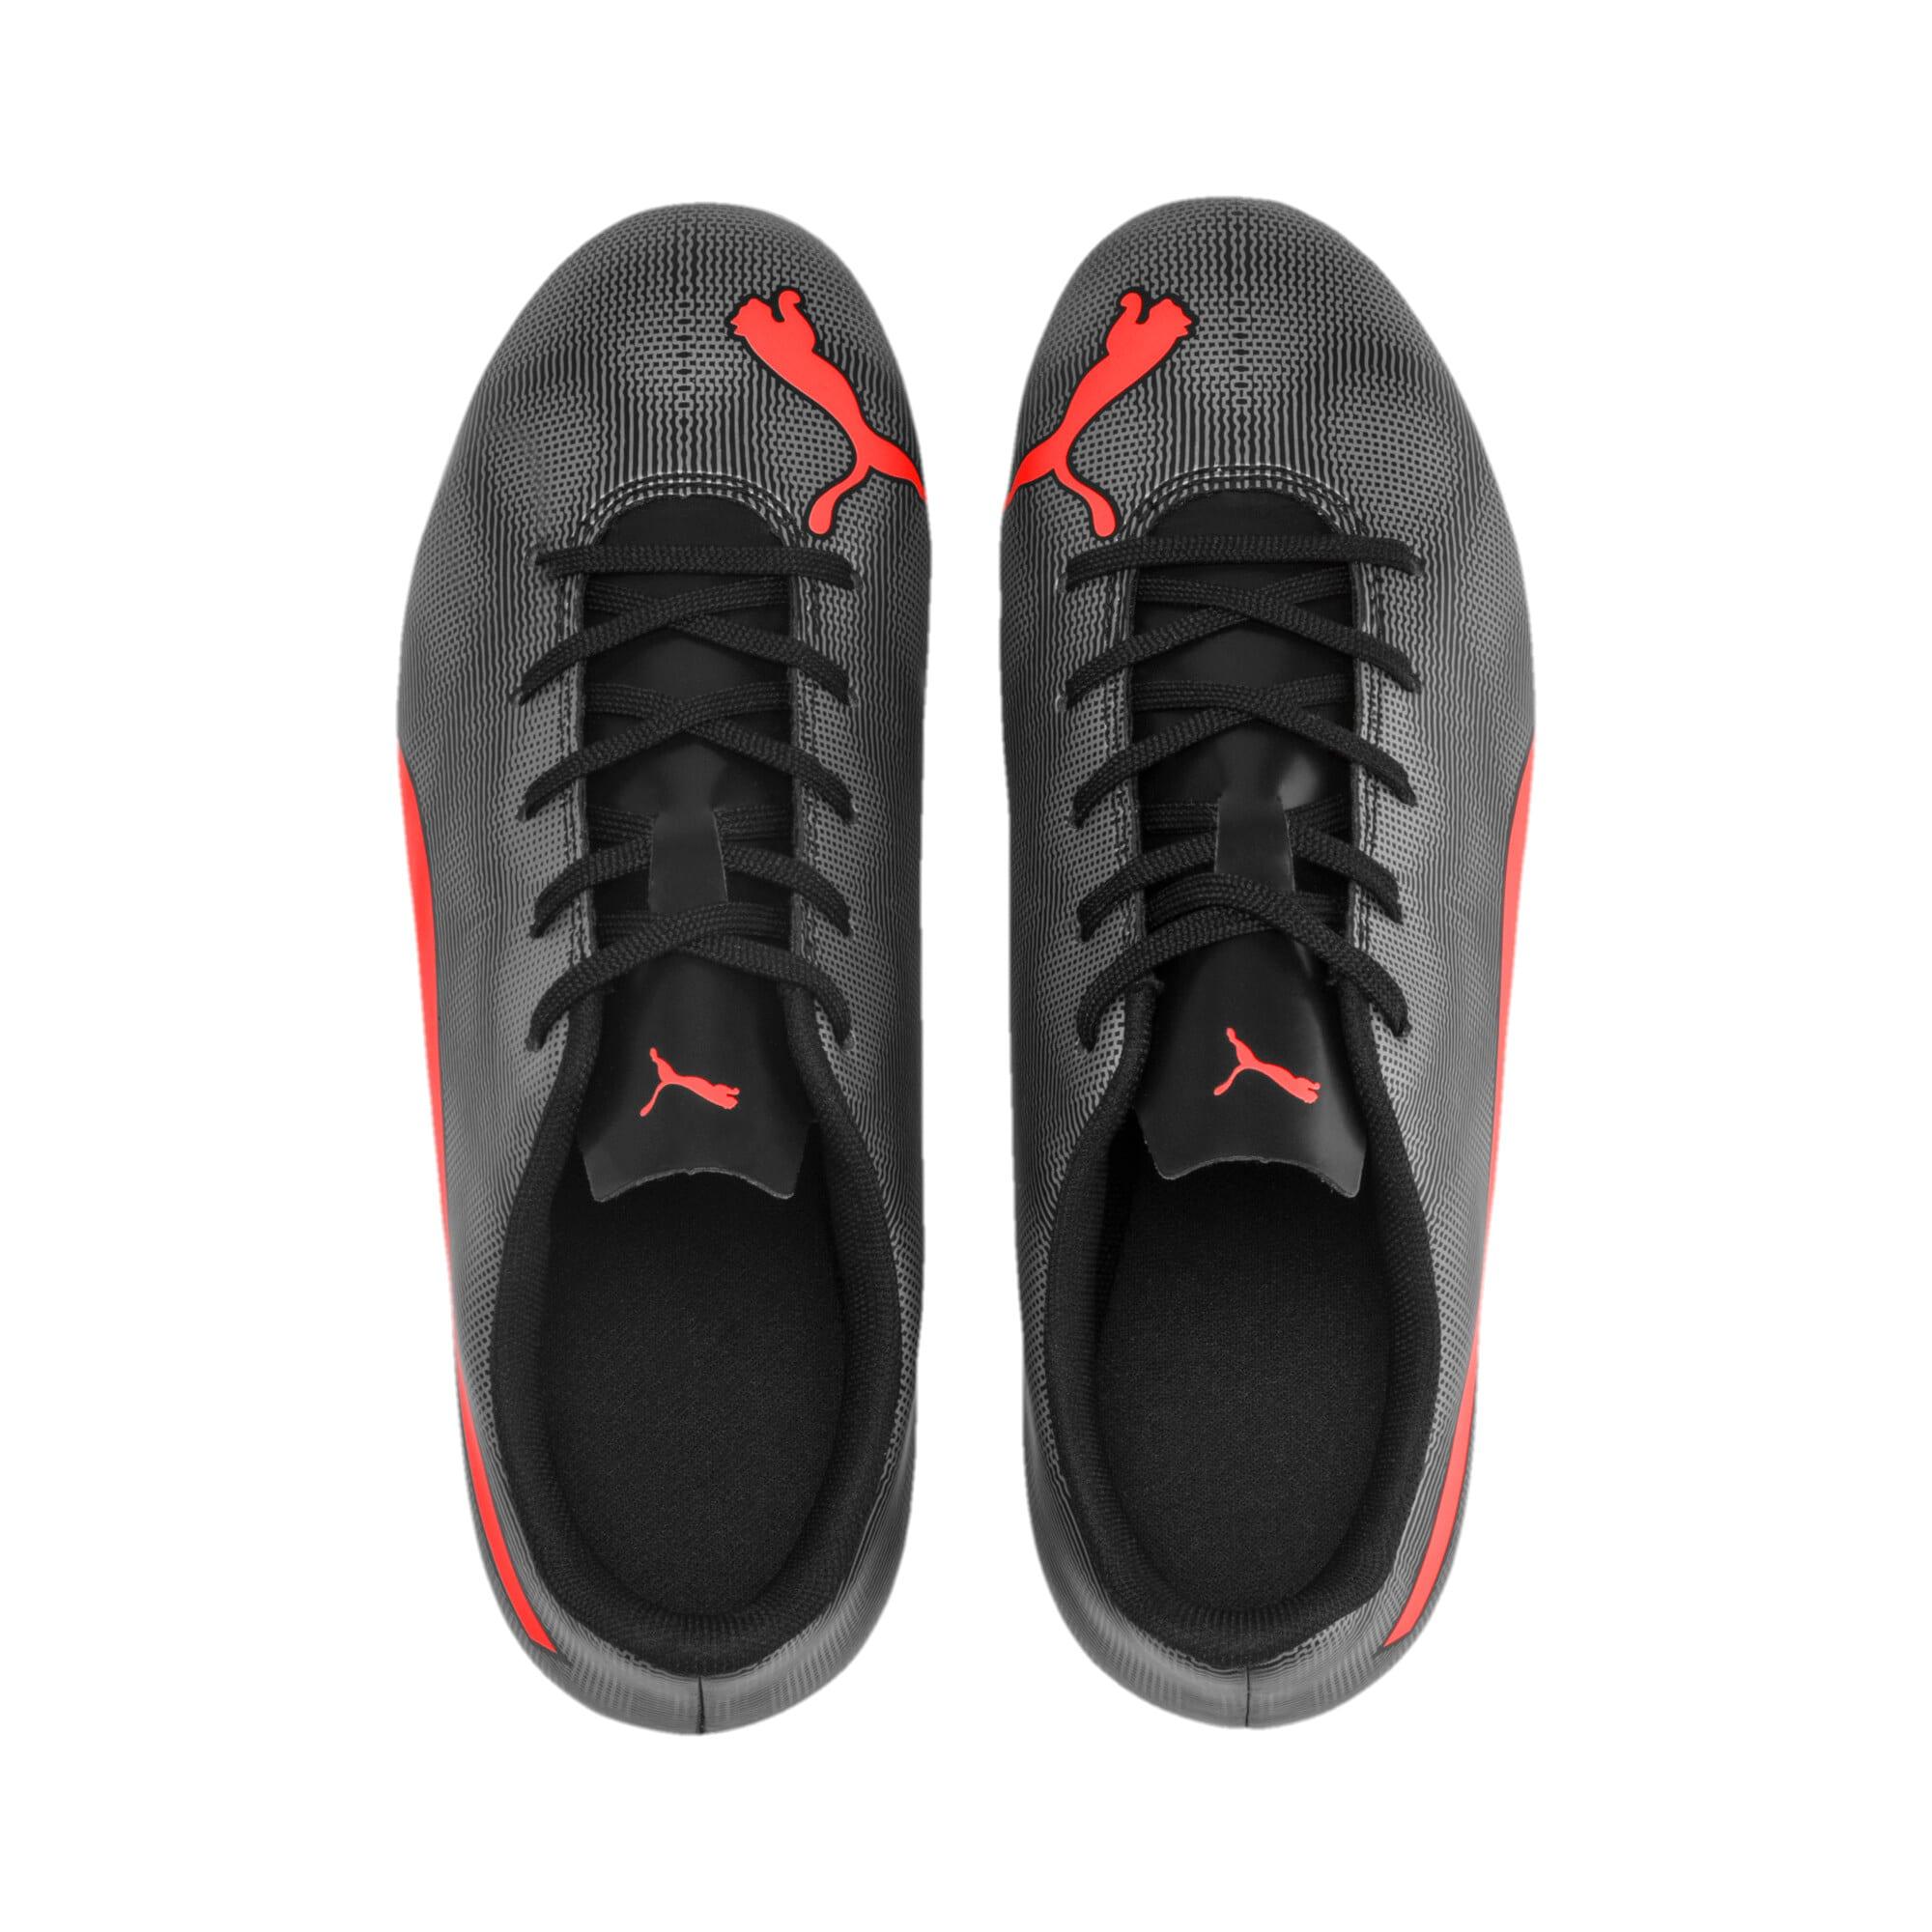 Thumbnail 6 of Rapido FG Boy's Soccer Cleats JR, Black-Nrgy Red-Aged Silver, medium